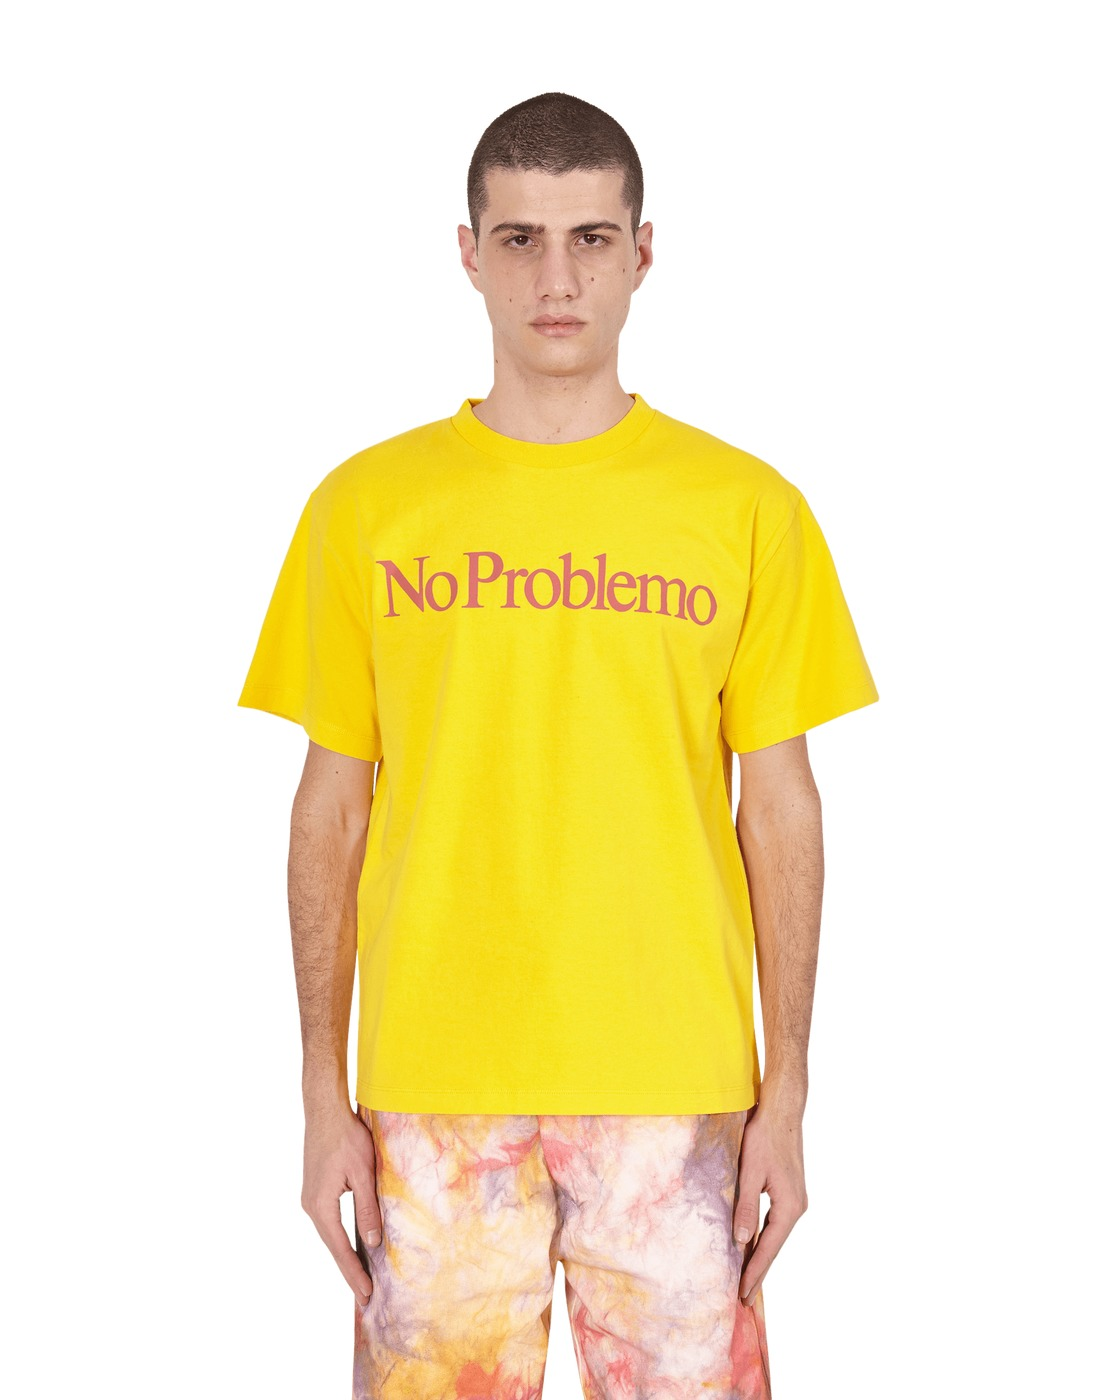 Aries No Problemo T Shirt Yellow